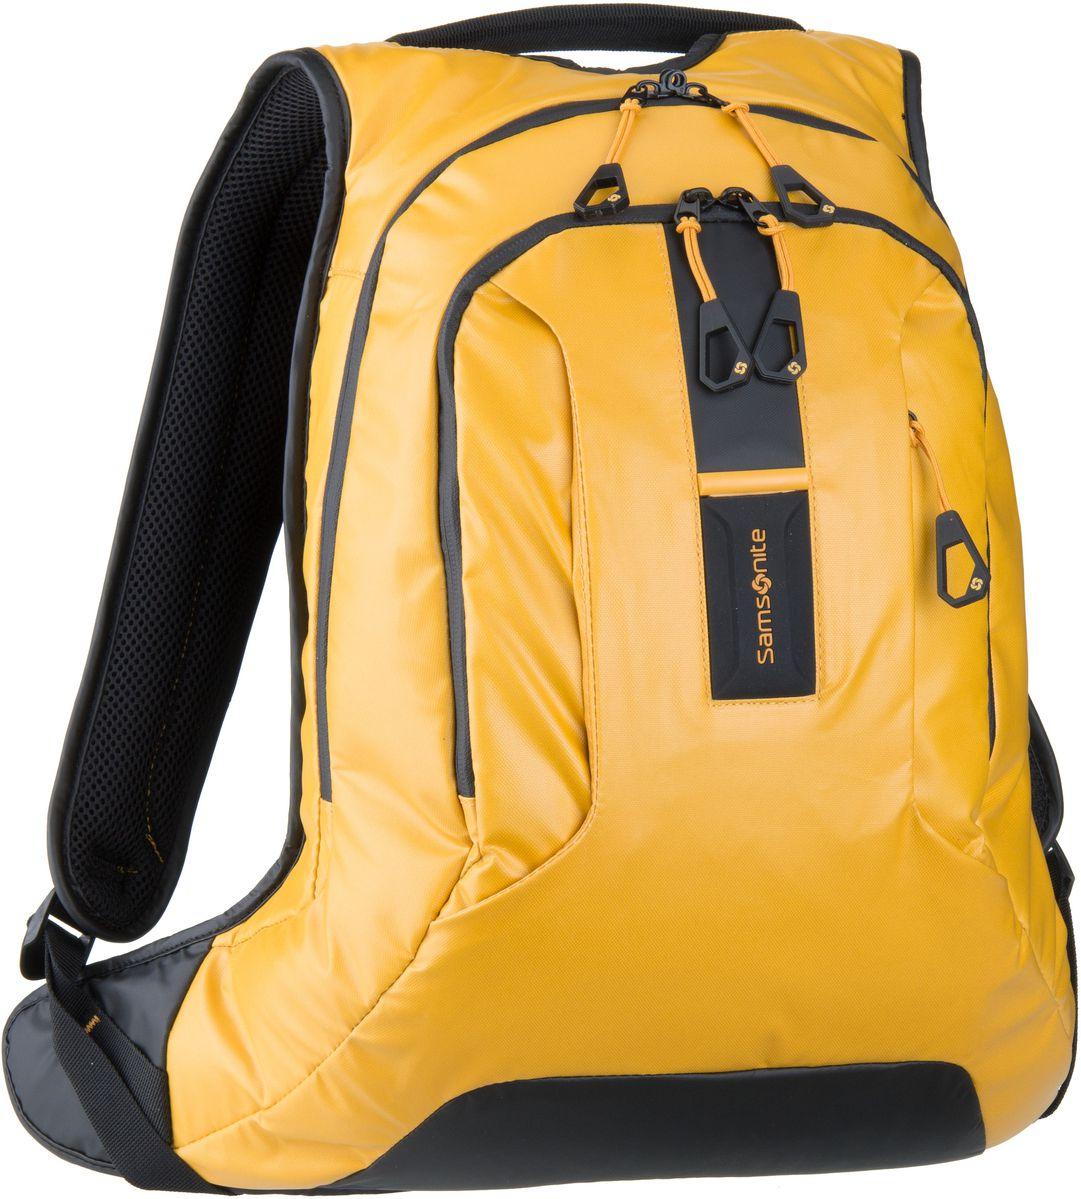 Samsonite Paradiver Light Laptop Backpack L Yel...